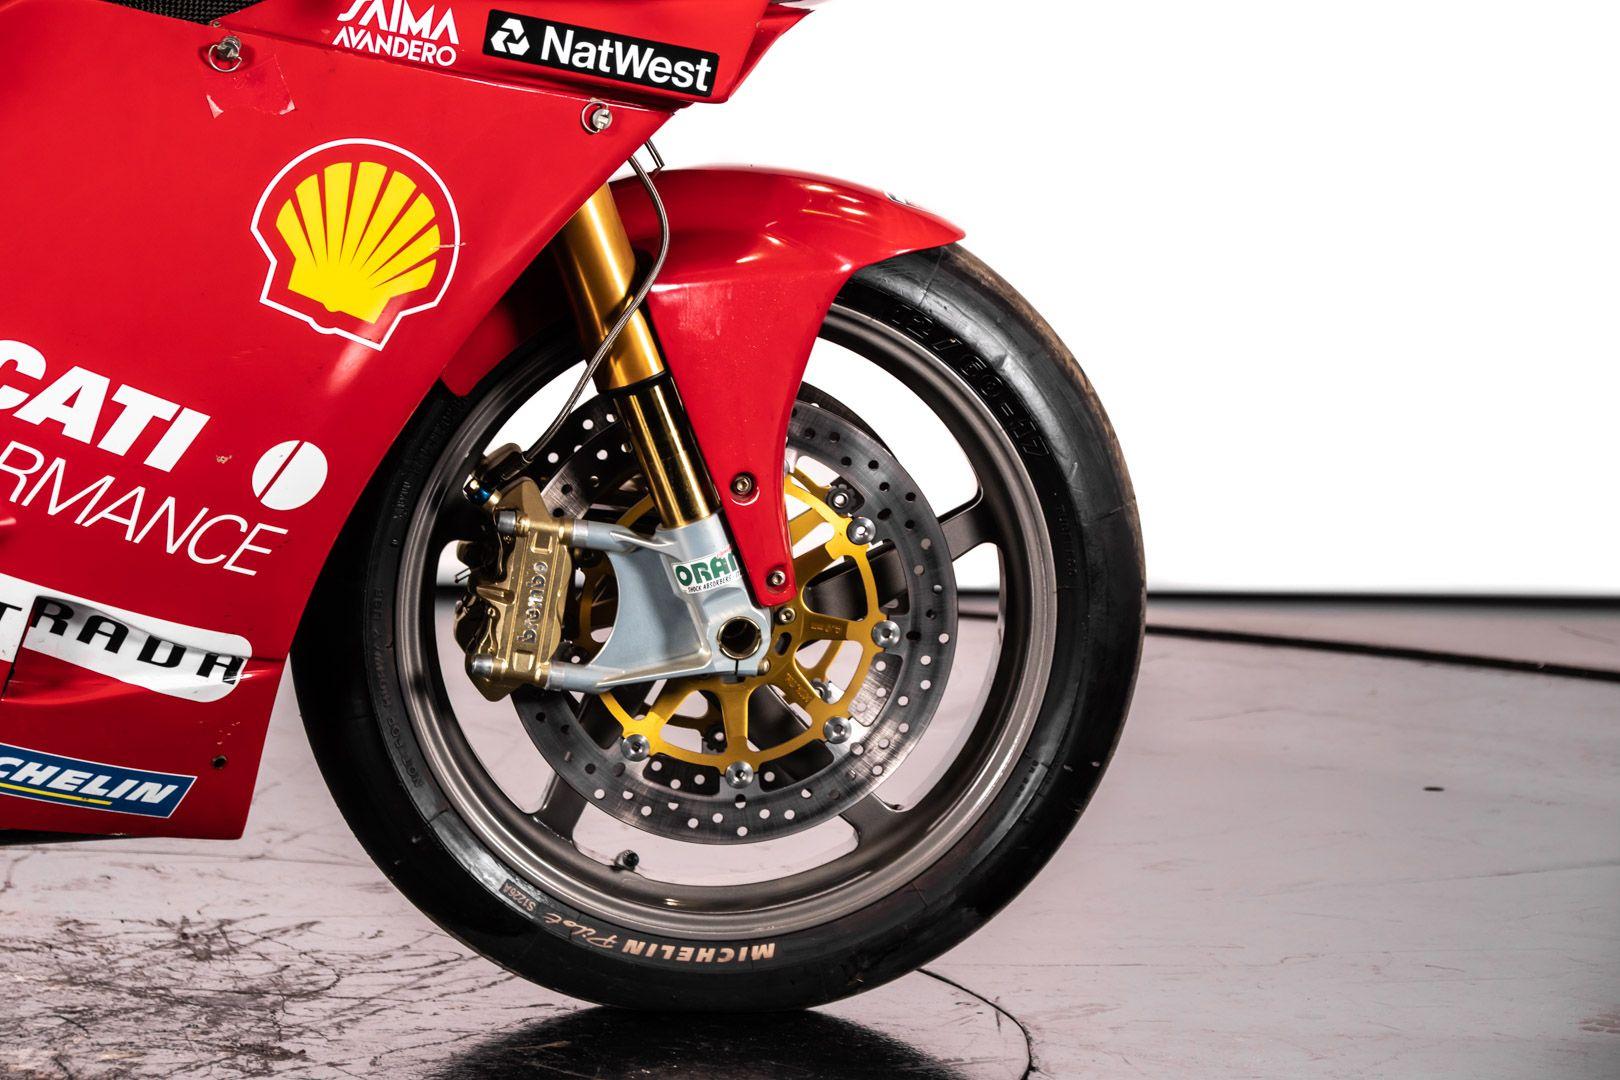 2008 Ducati 996 Fogarty Evocation 03/12 84220